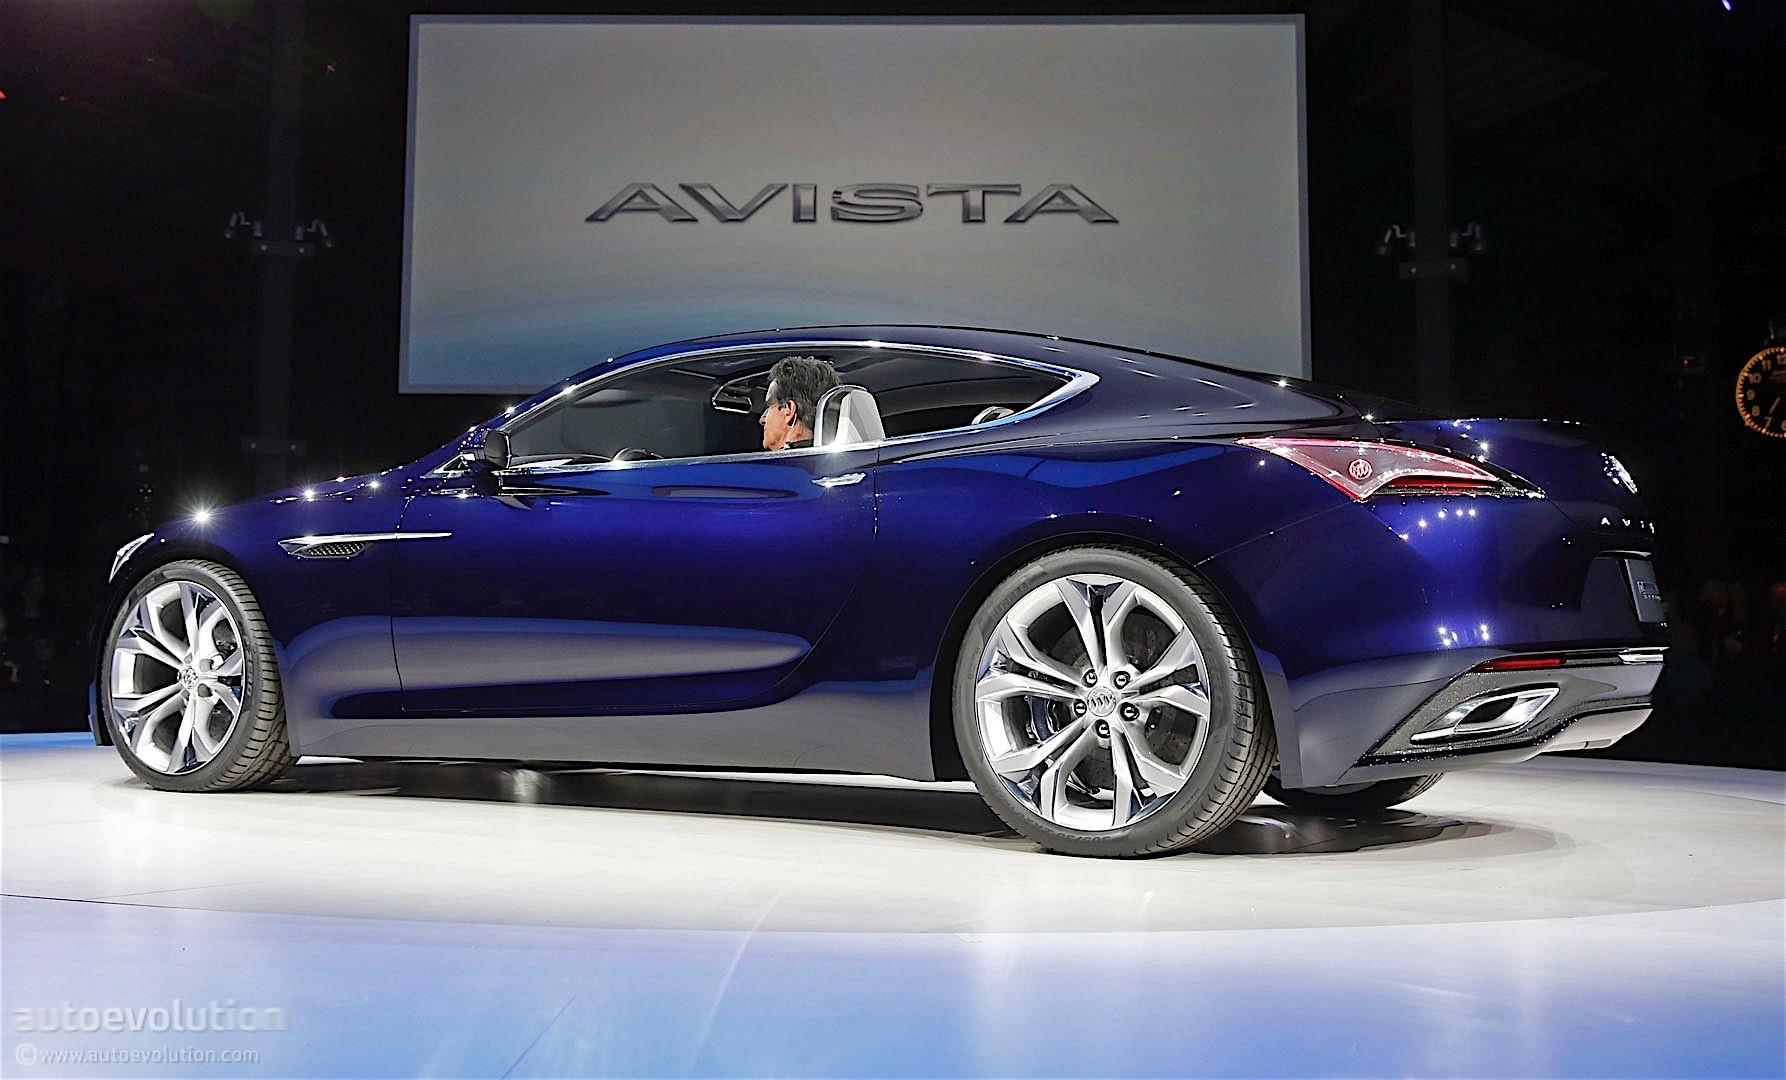 buick avista concept bows at 2016 detroit auto show. Black Bedroom Furniture Sets. Home Design Ideas